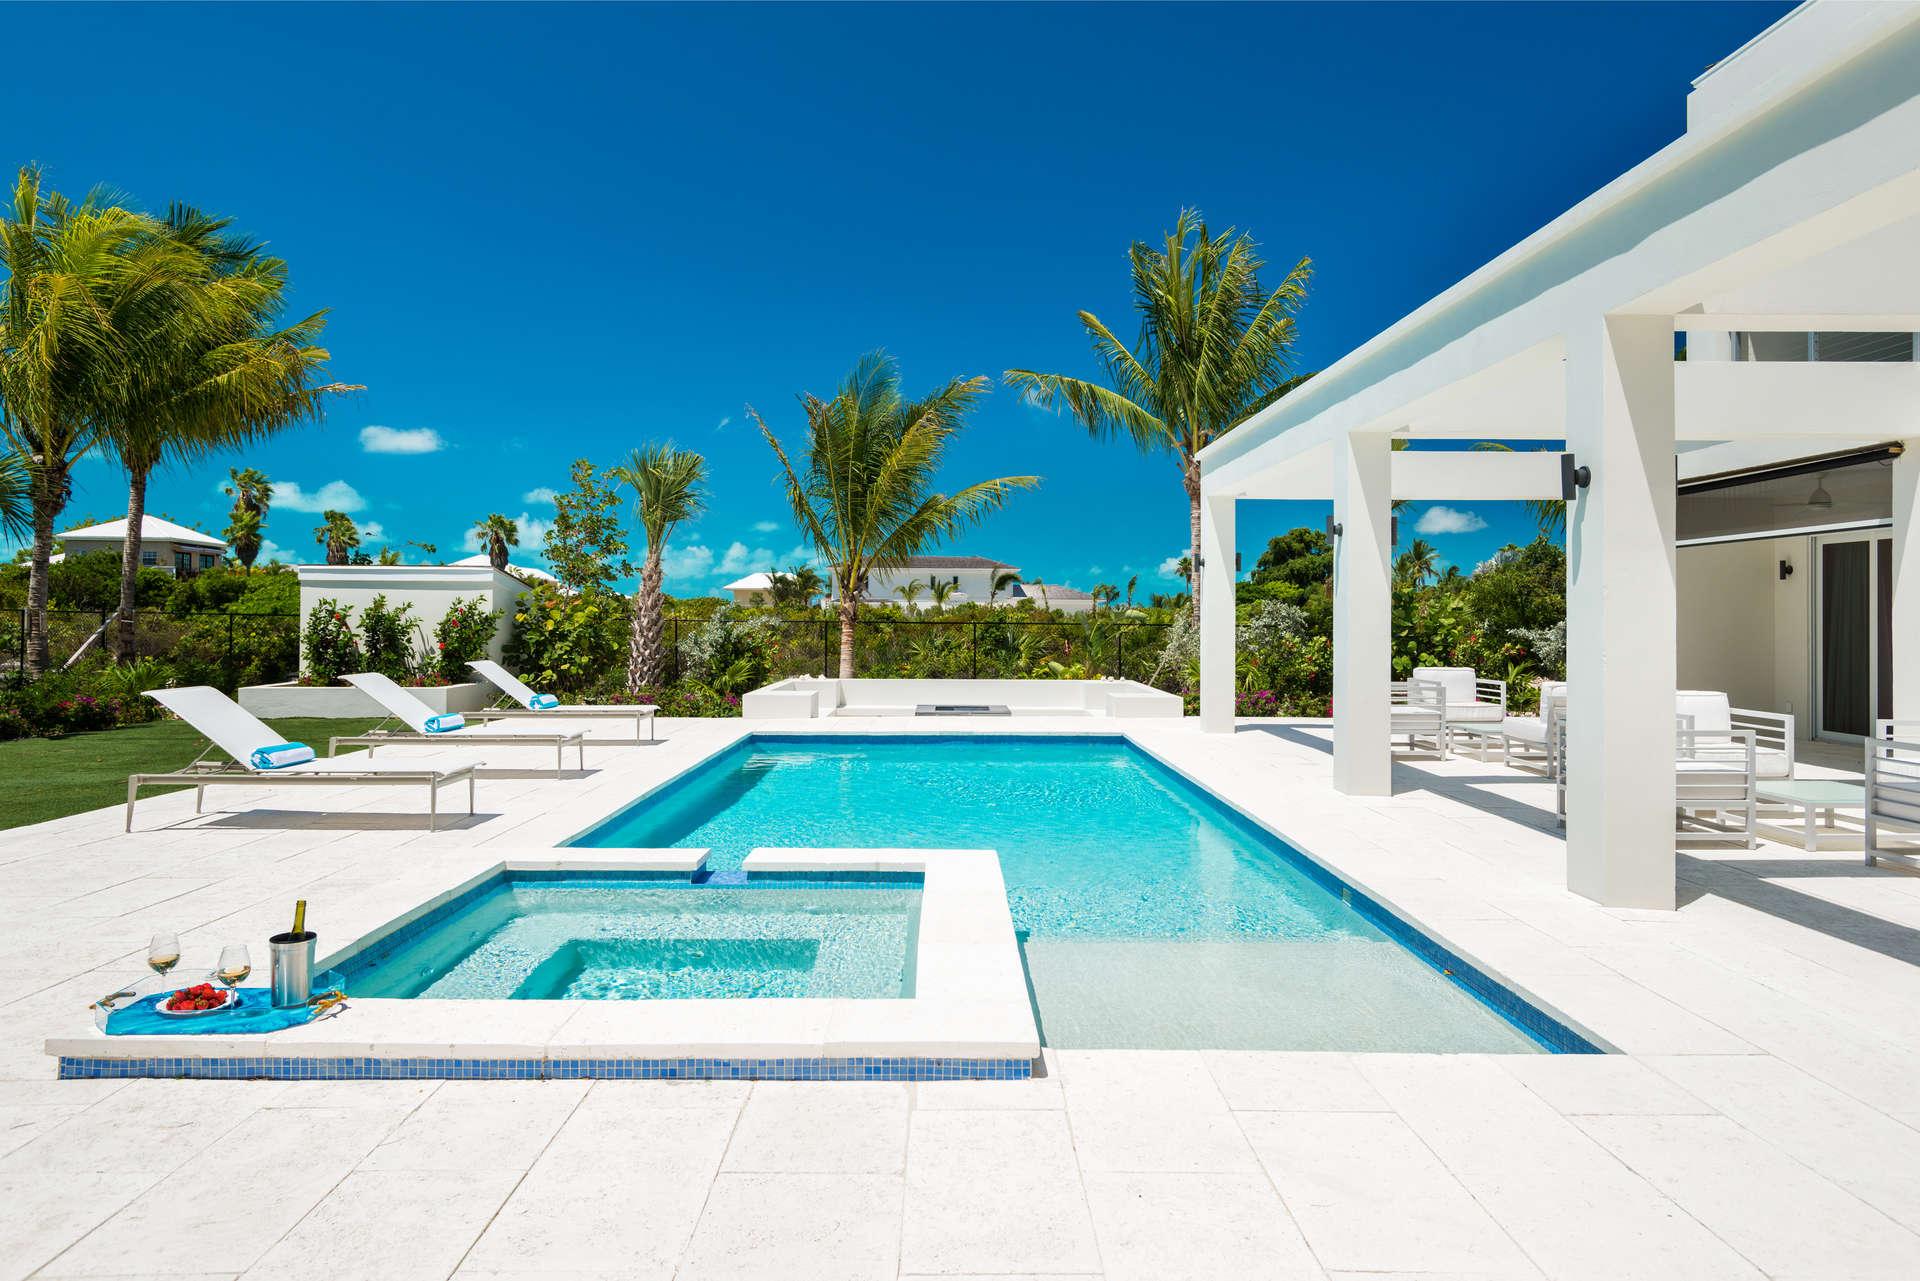 Luxury villa rentals caribbean - Turks and caicos - Providenciales - Grace bay - Turquoise Villa - Image 1/21